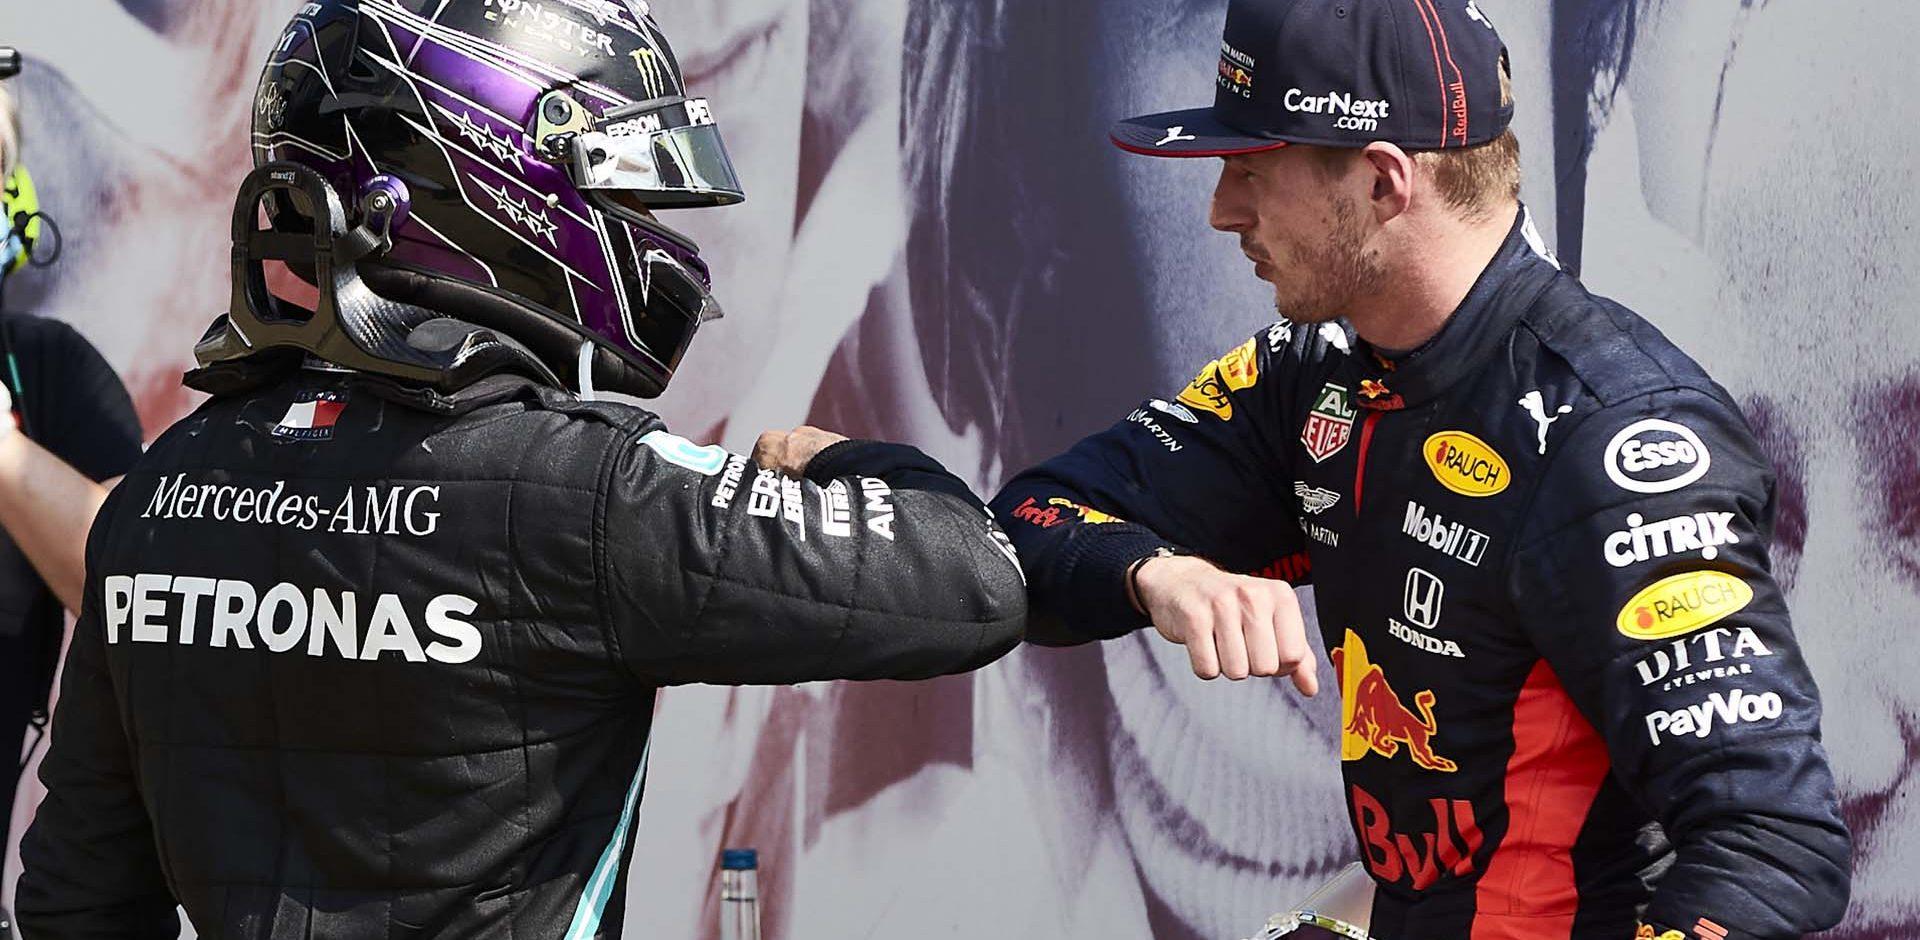 2020 70th Anniversary Grand Prix, Sunday - Steve Etherington Lewis Hamilton Max Verstappen Mercede Red Bull